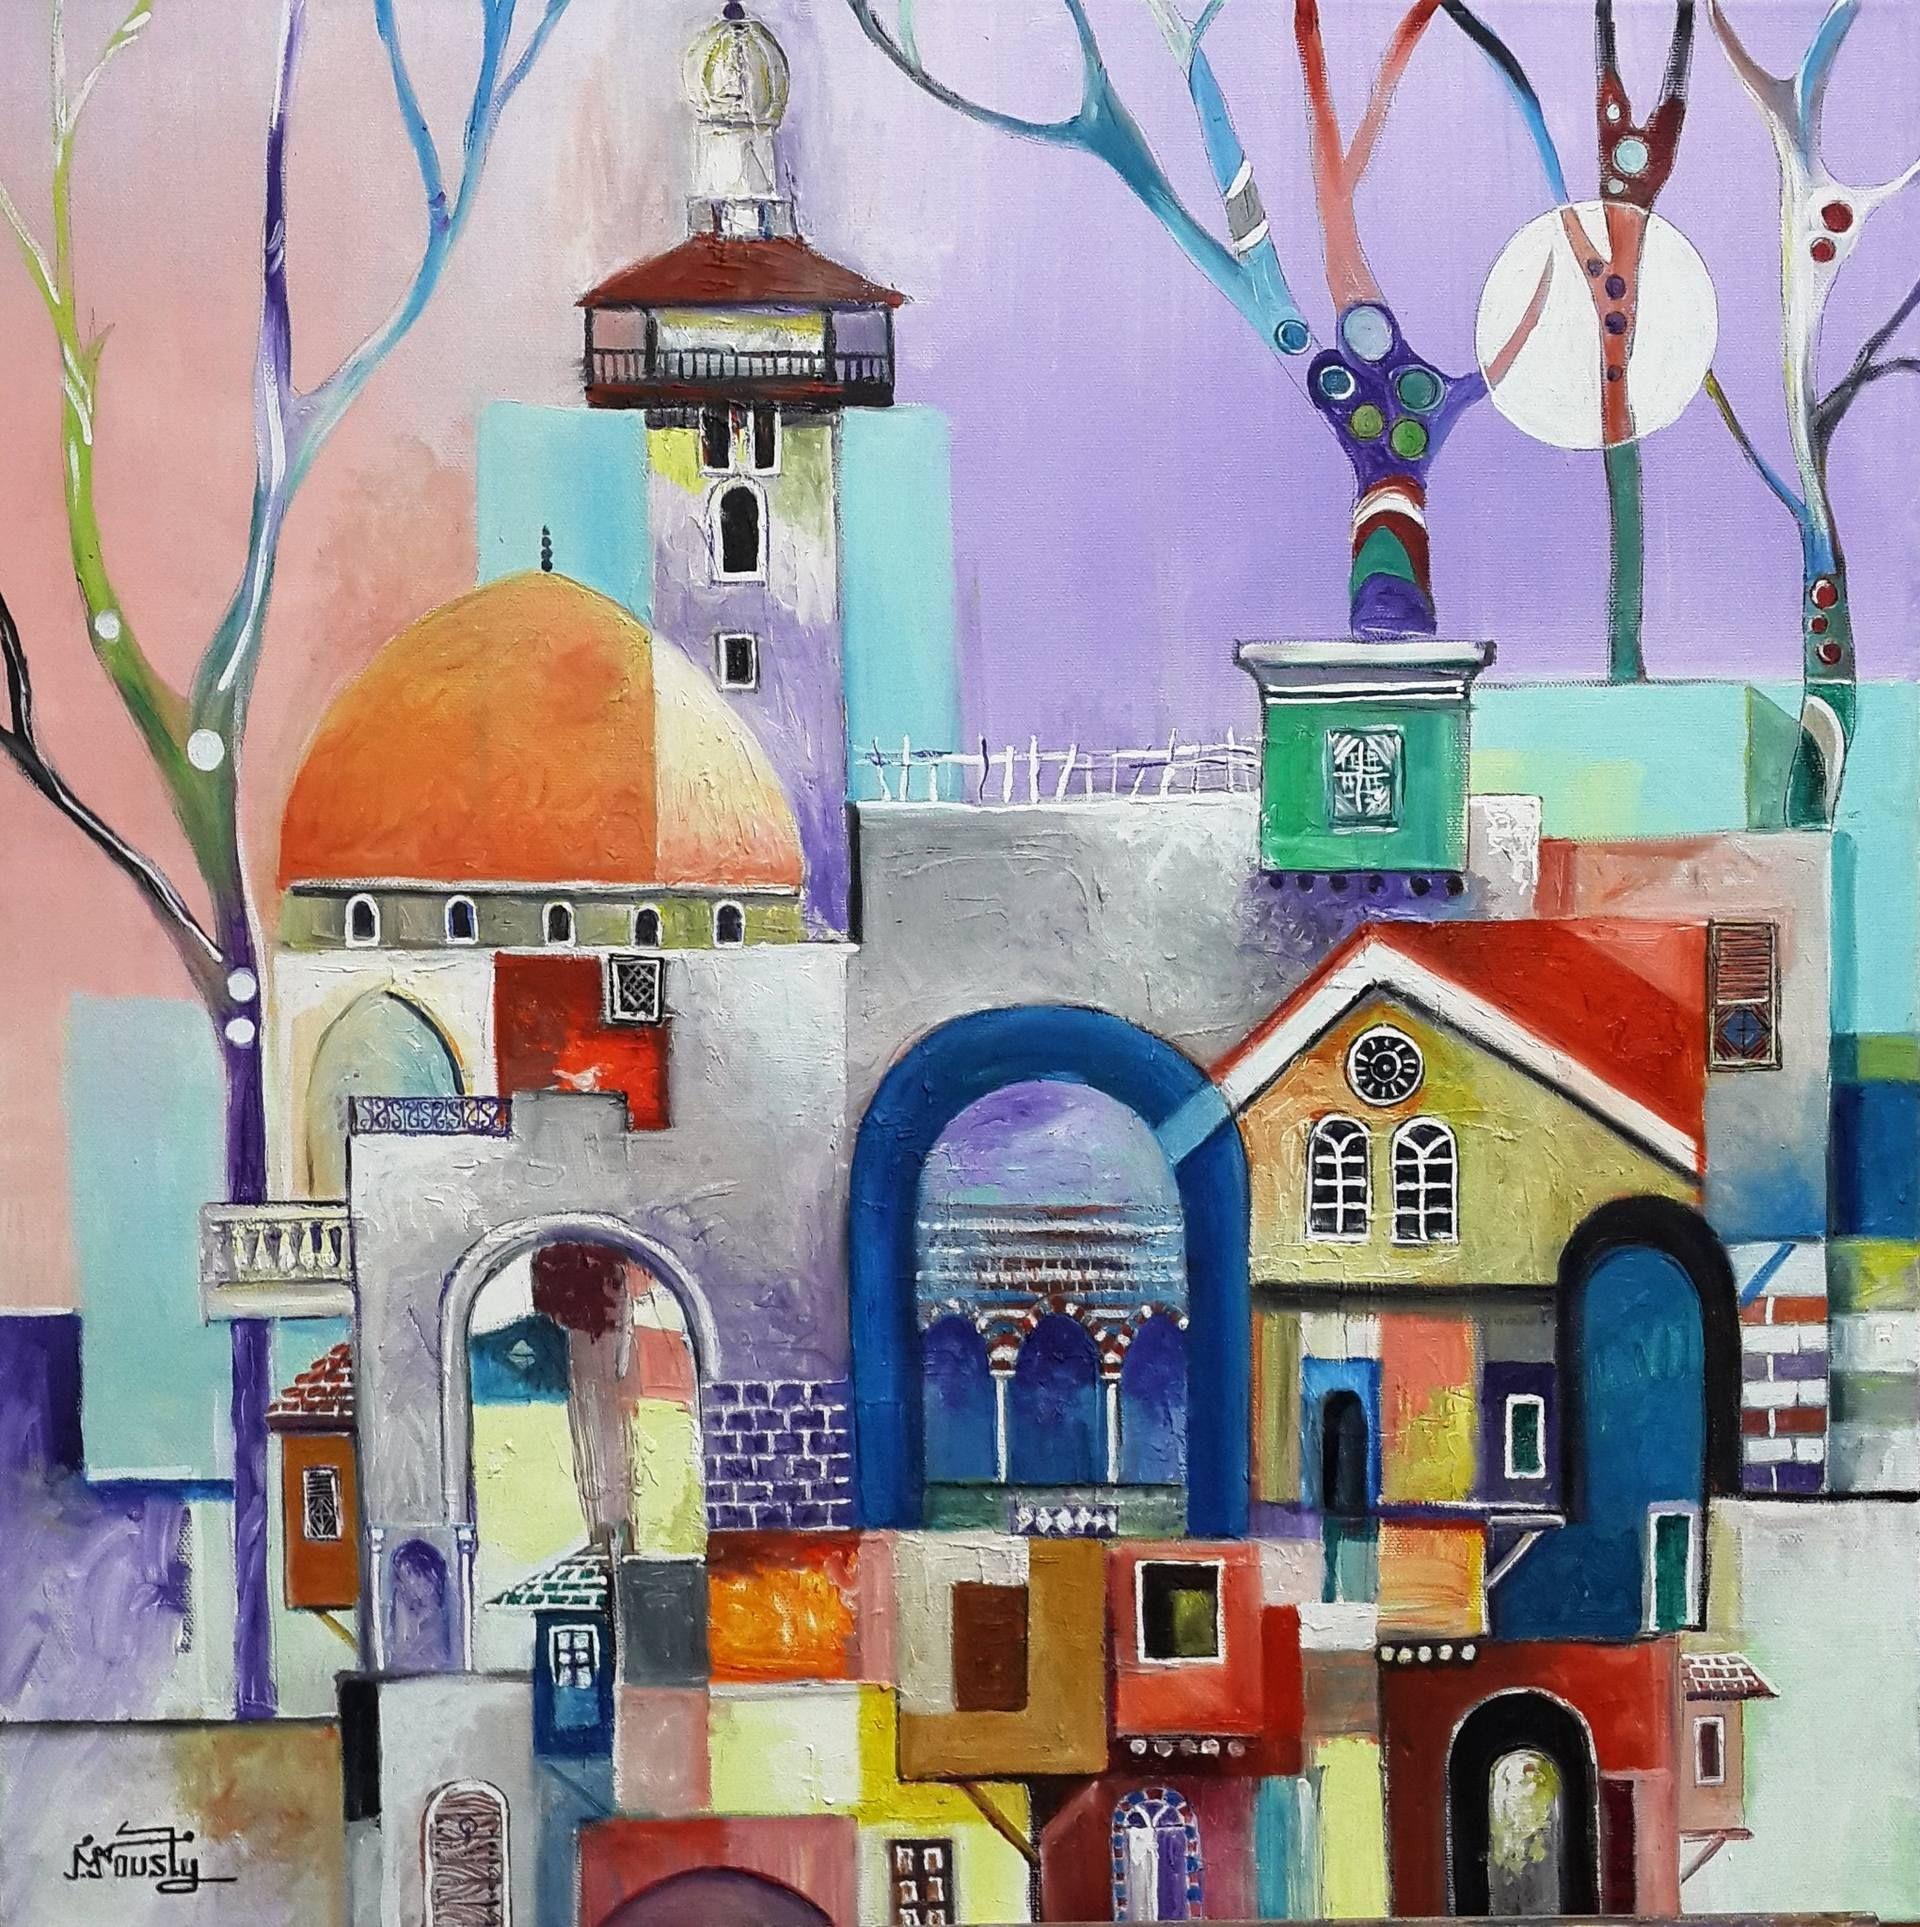 Pin By Bnt Almalki On تراثيات Art Paint Party Ramadan Decorations Arabian Art